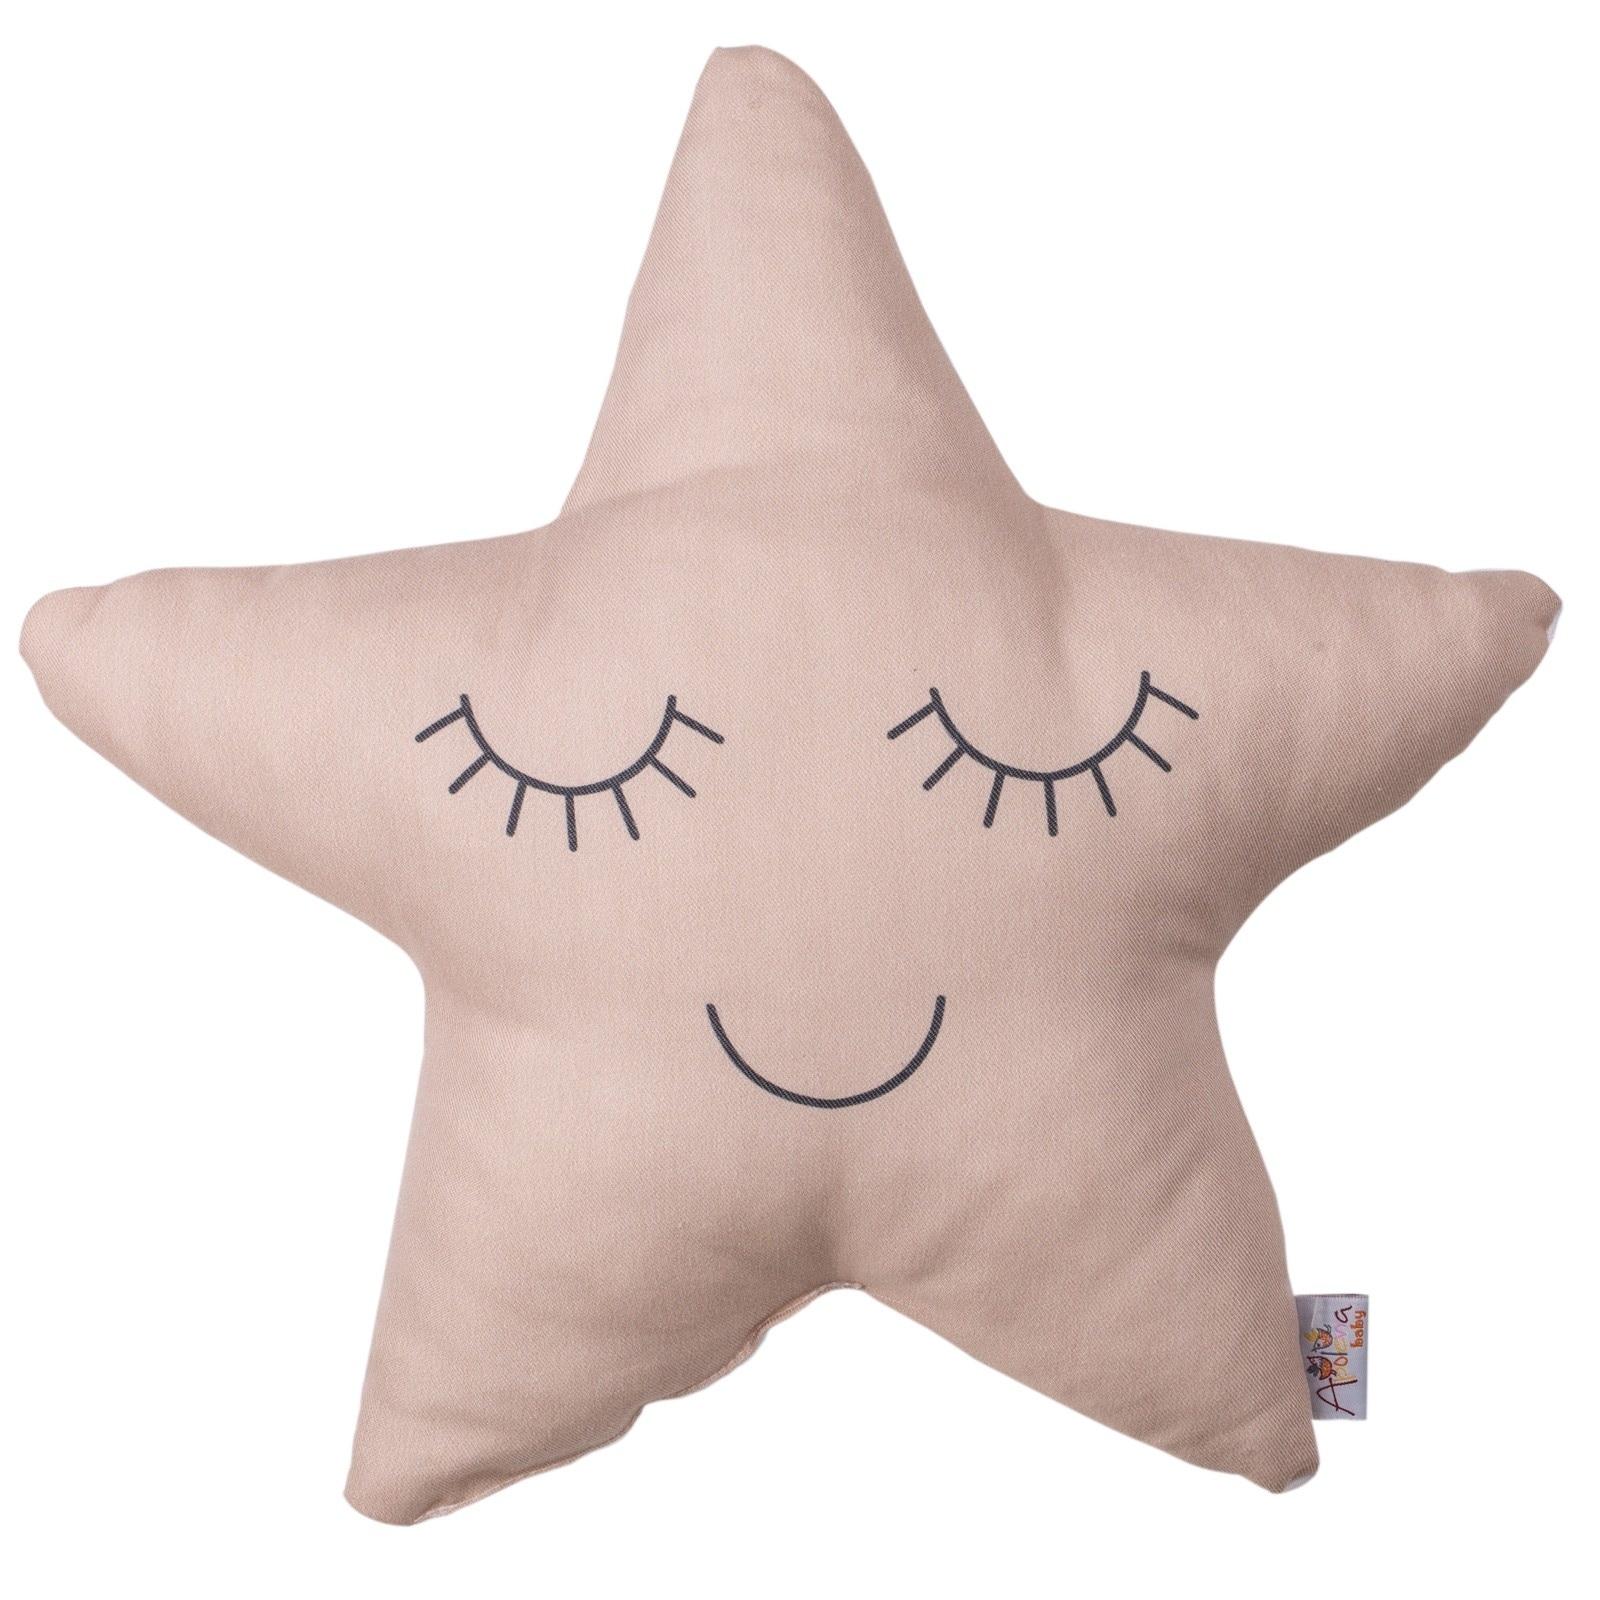 Ebebek Apolena Star Toy Baby Pillow 38x38x10 Cm